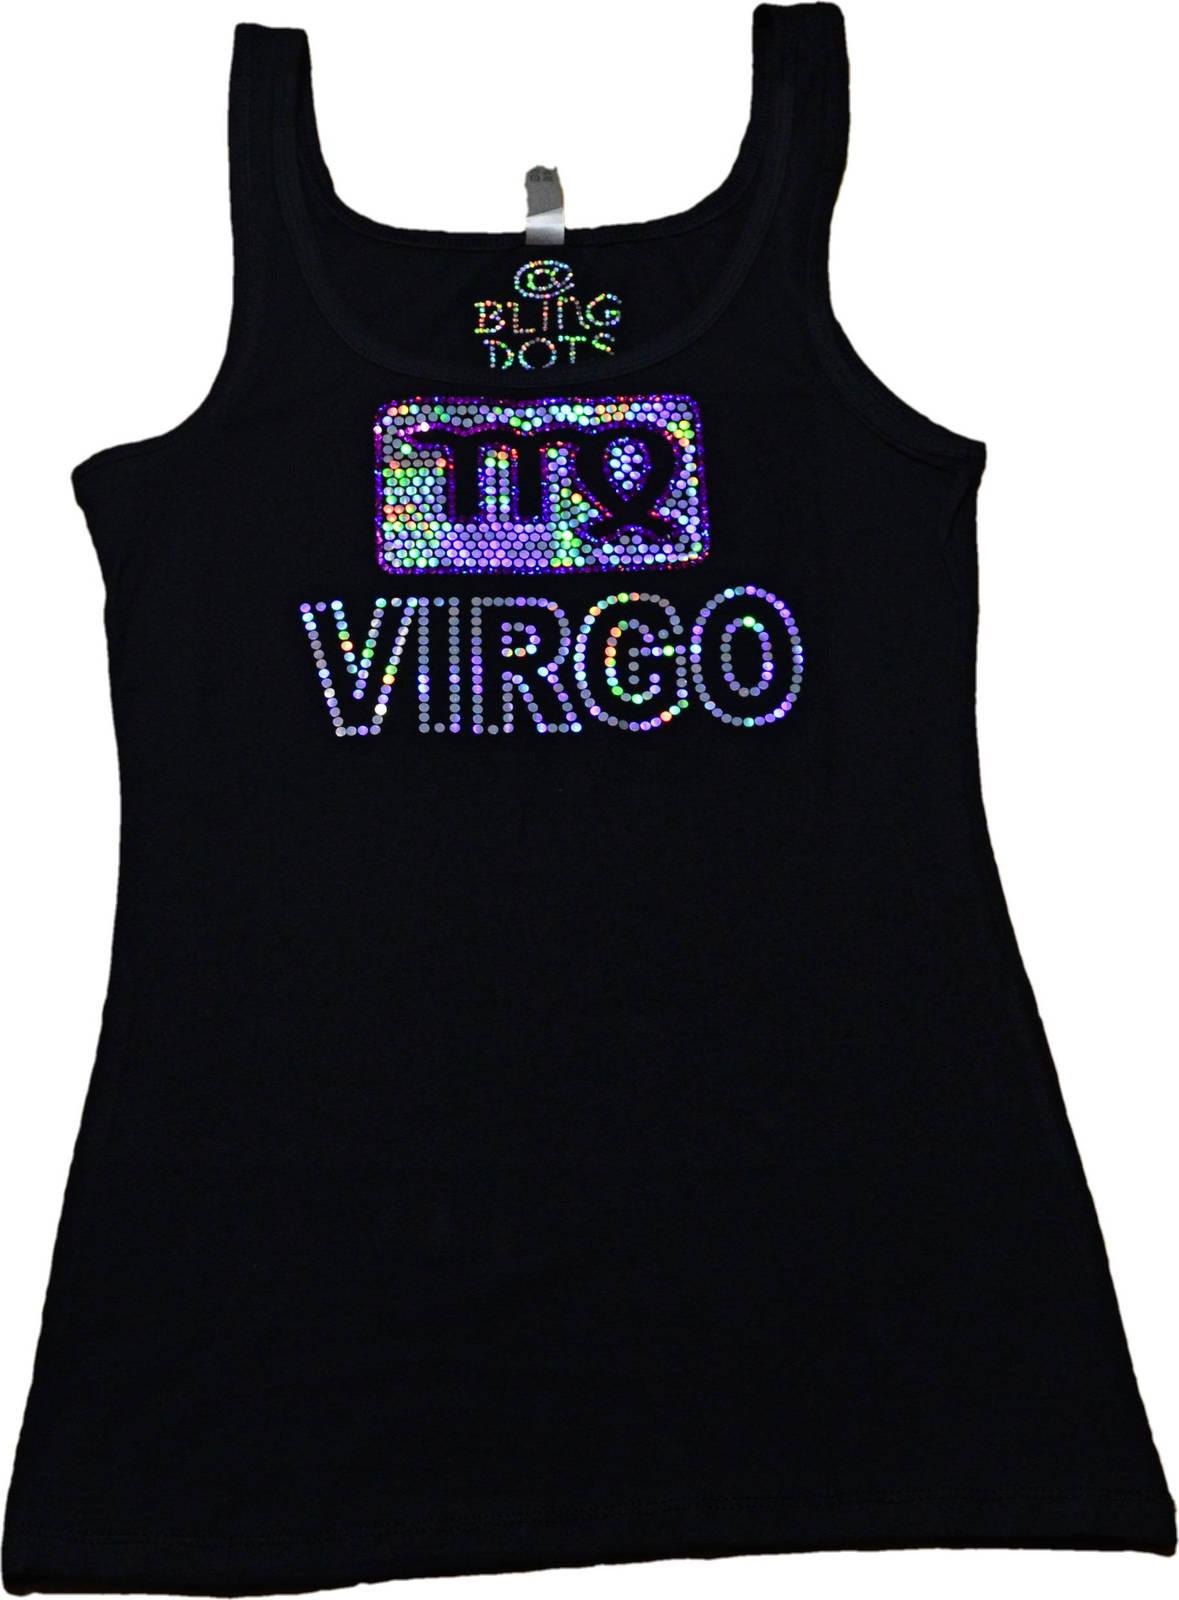 Virgo Bling Shirt Sequins Tank top Zodiac signs no rhinestones glitter tee